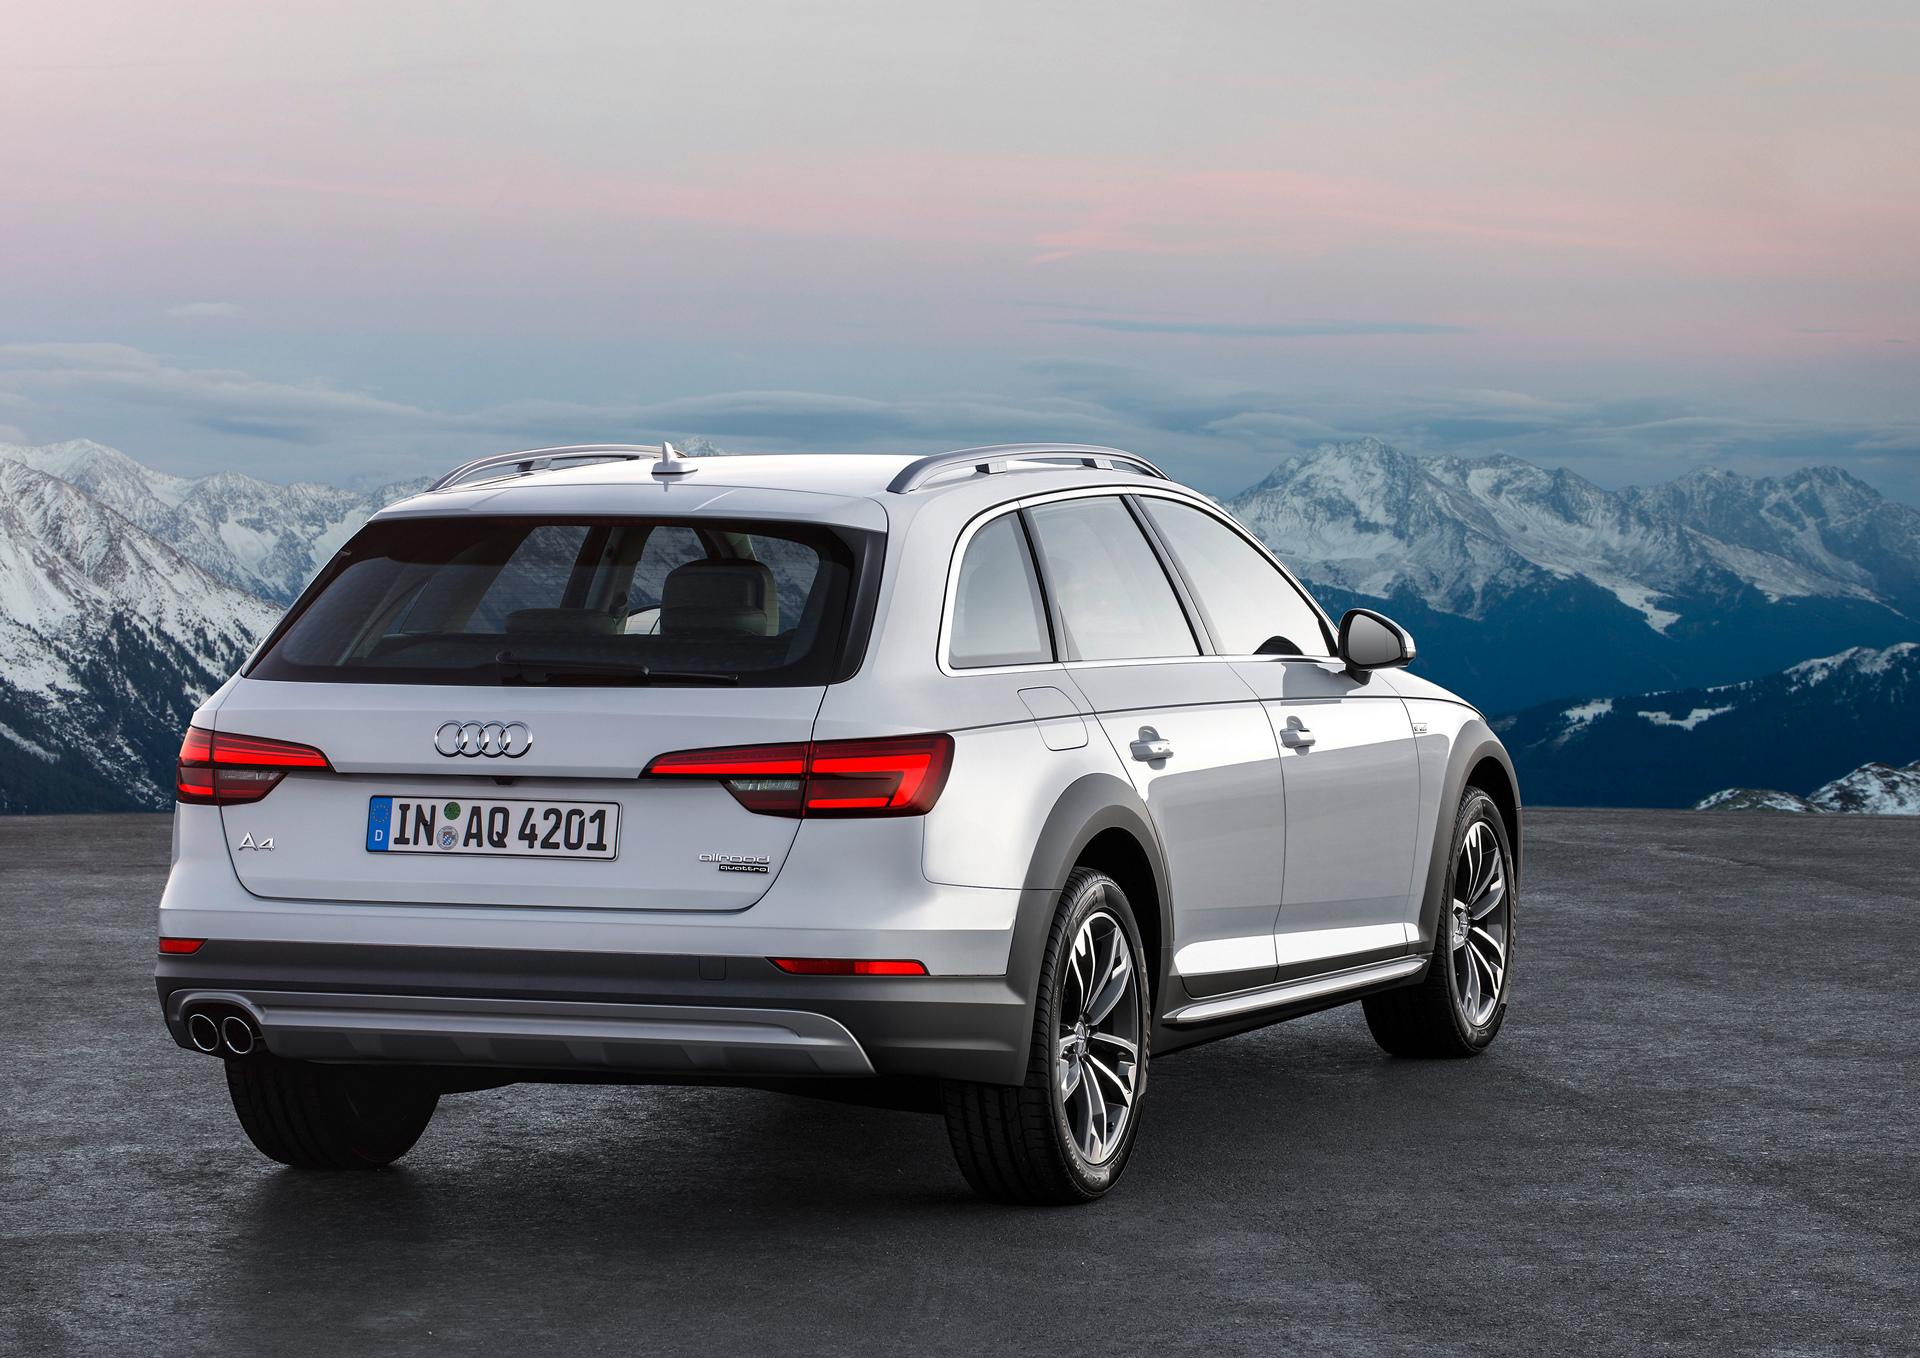 2017 Audi A4 allroad © Volkswagen AG